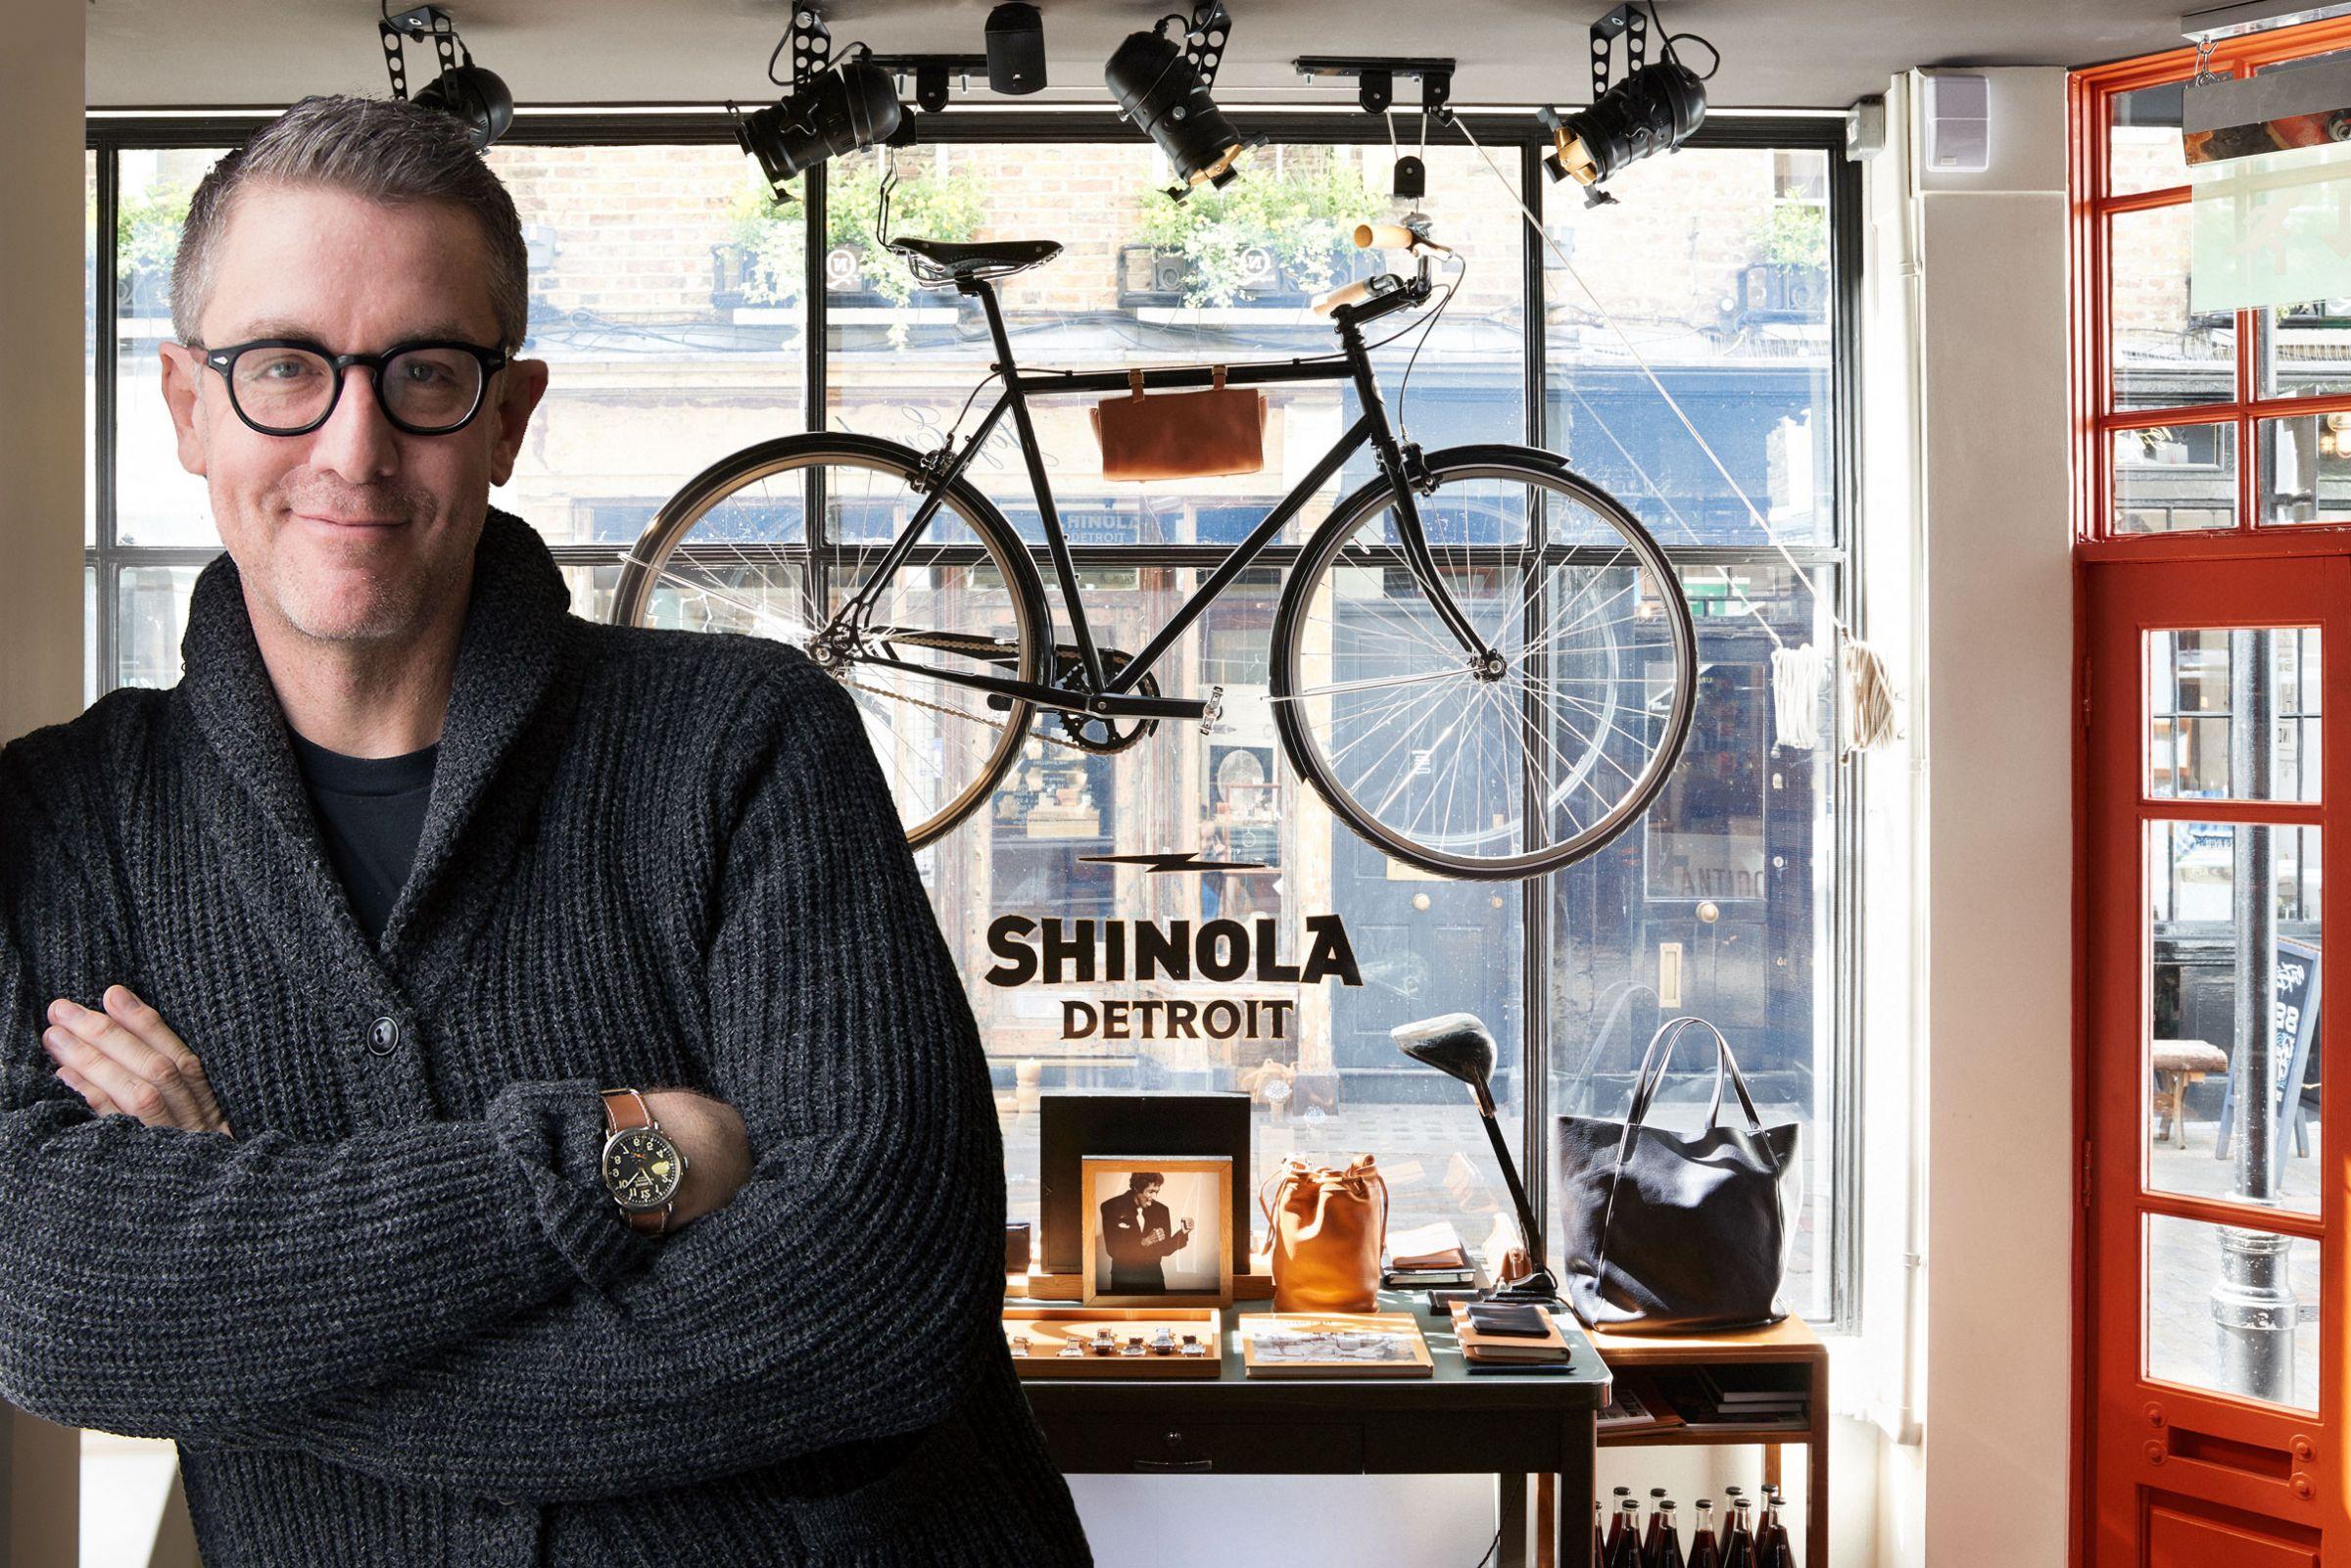 Daniel Caudill, Creative Director Of Shinola Detroit